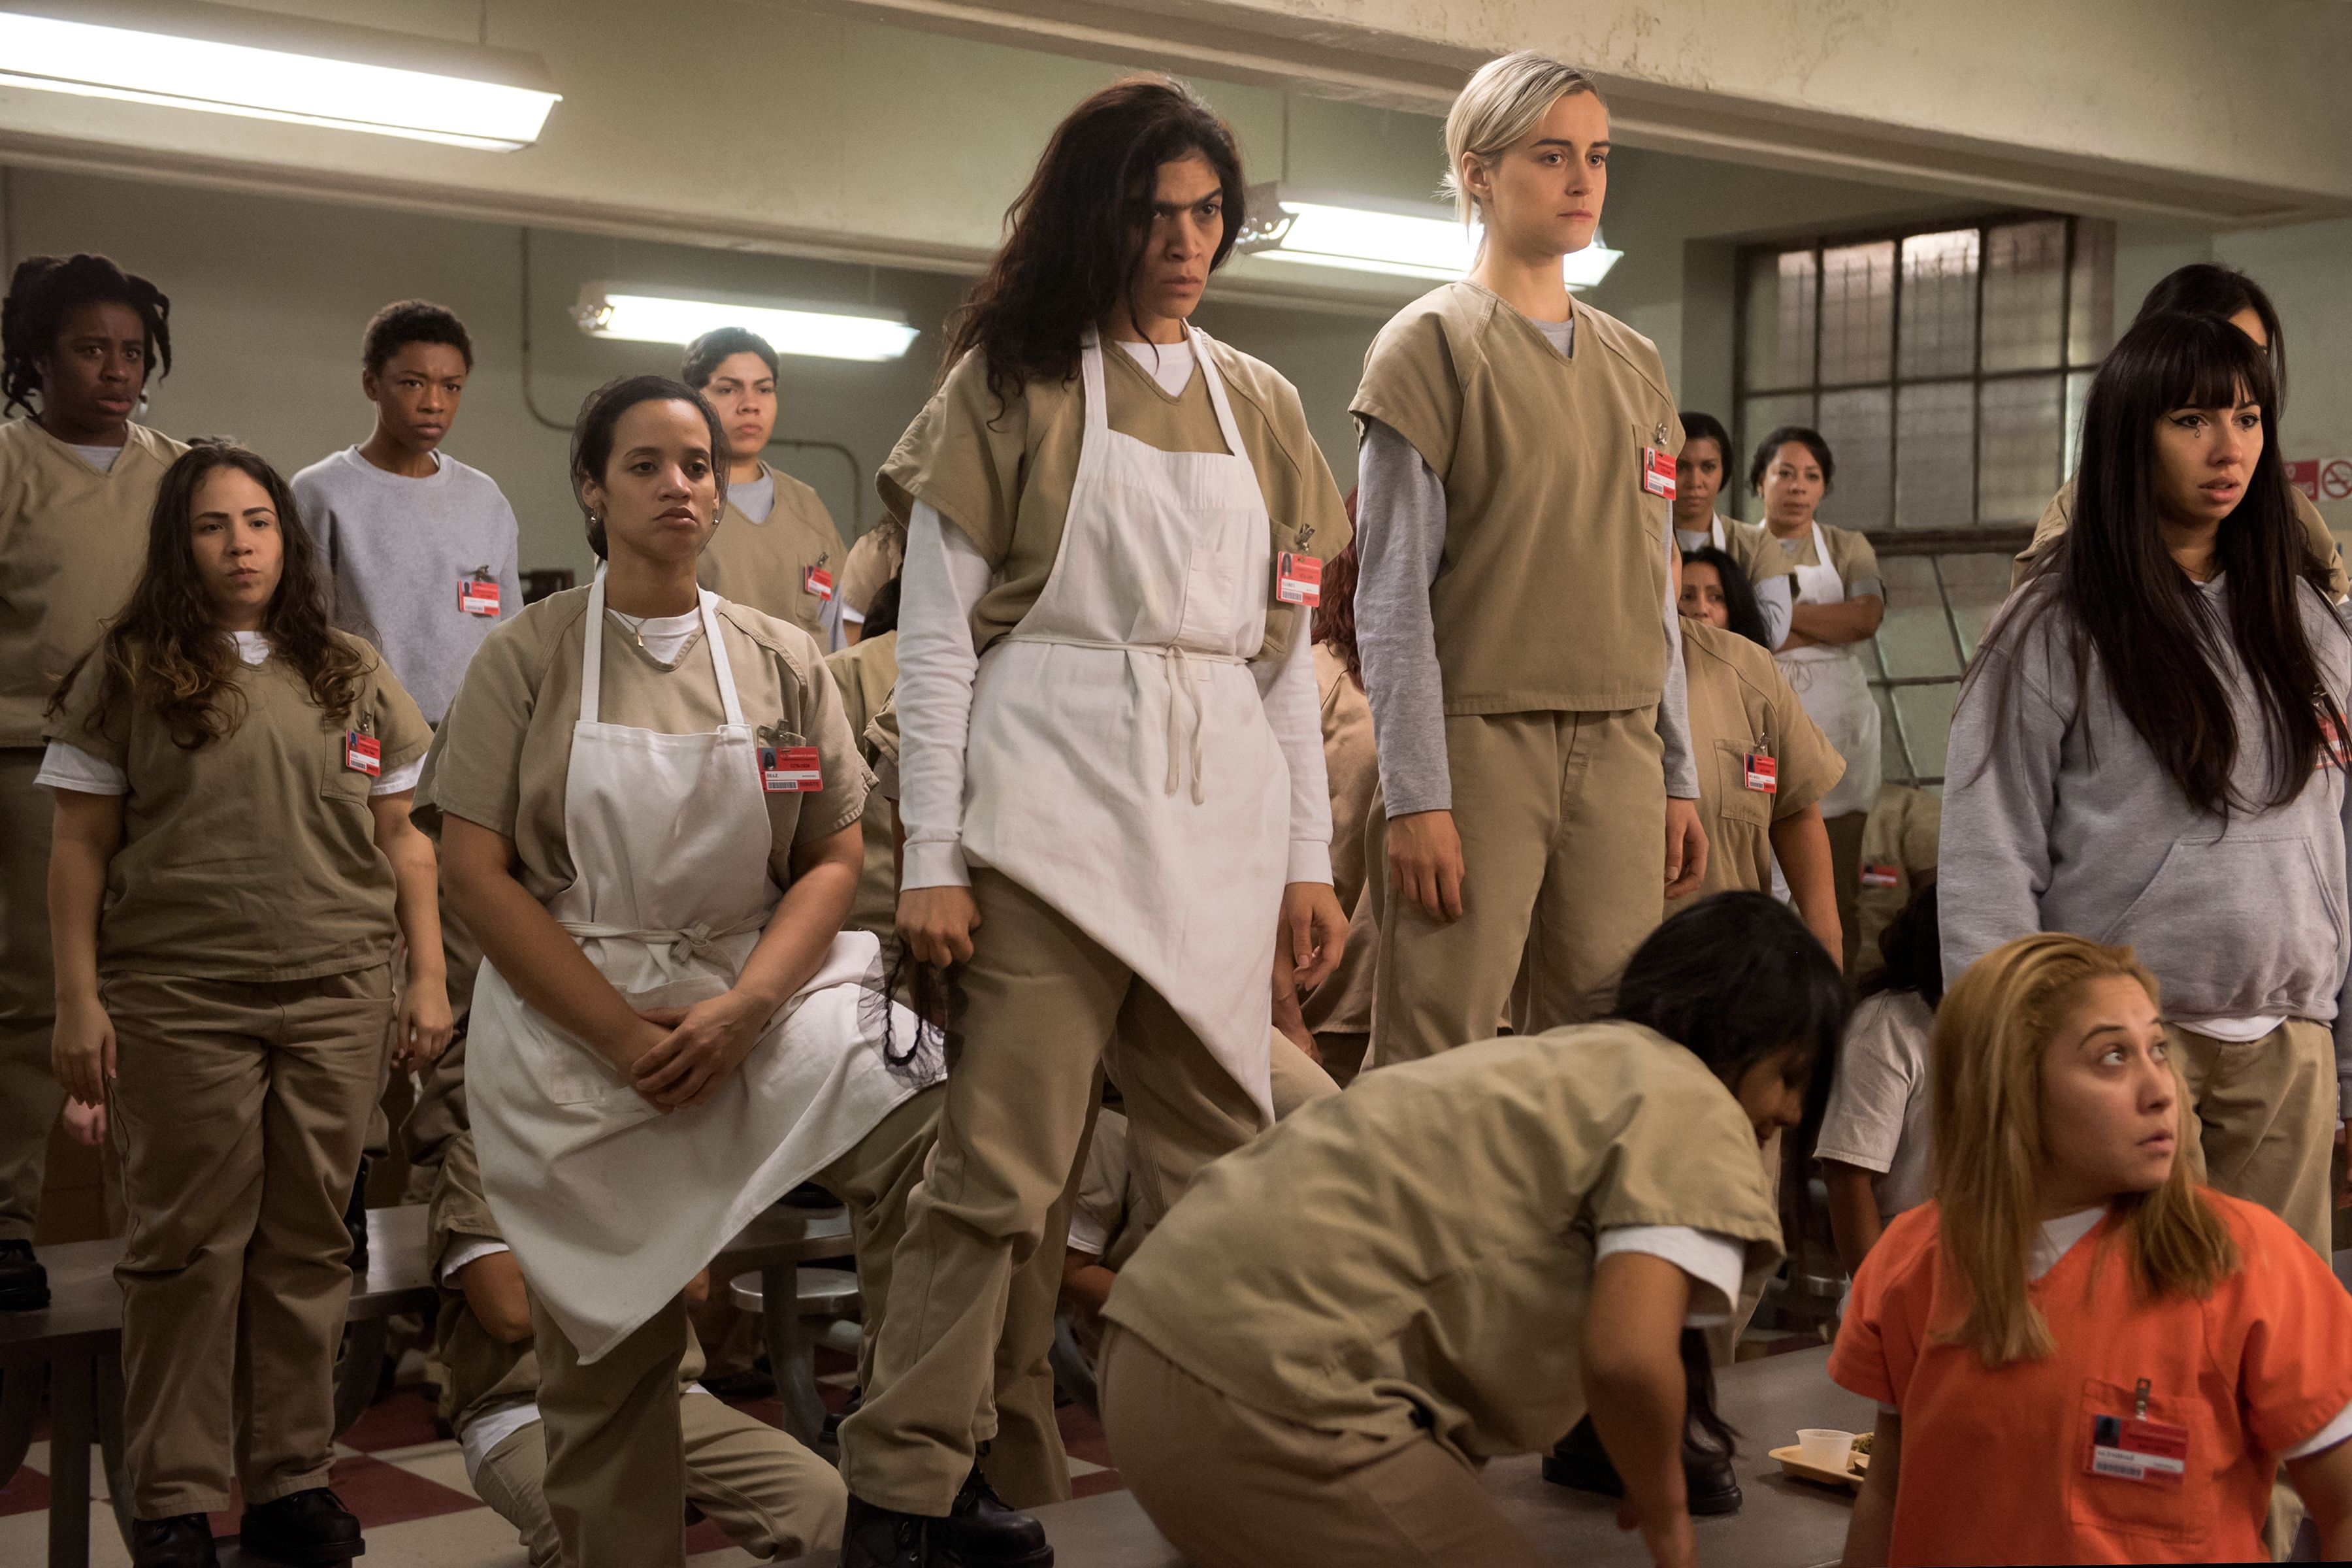 'Orange Is the New Black' Season 6 Finally Gets Release Date